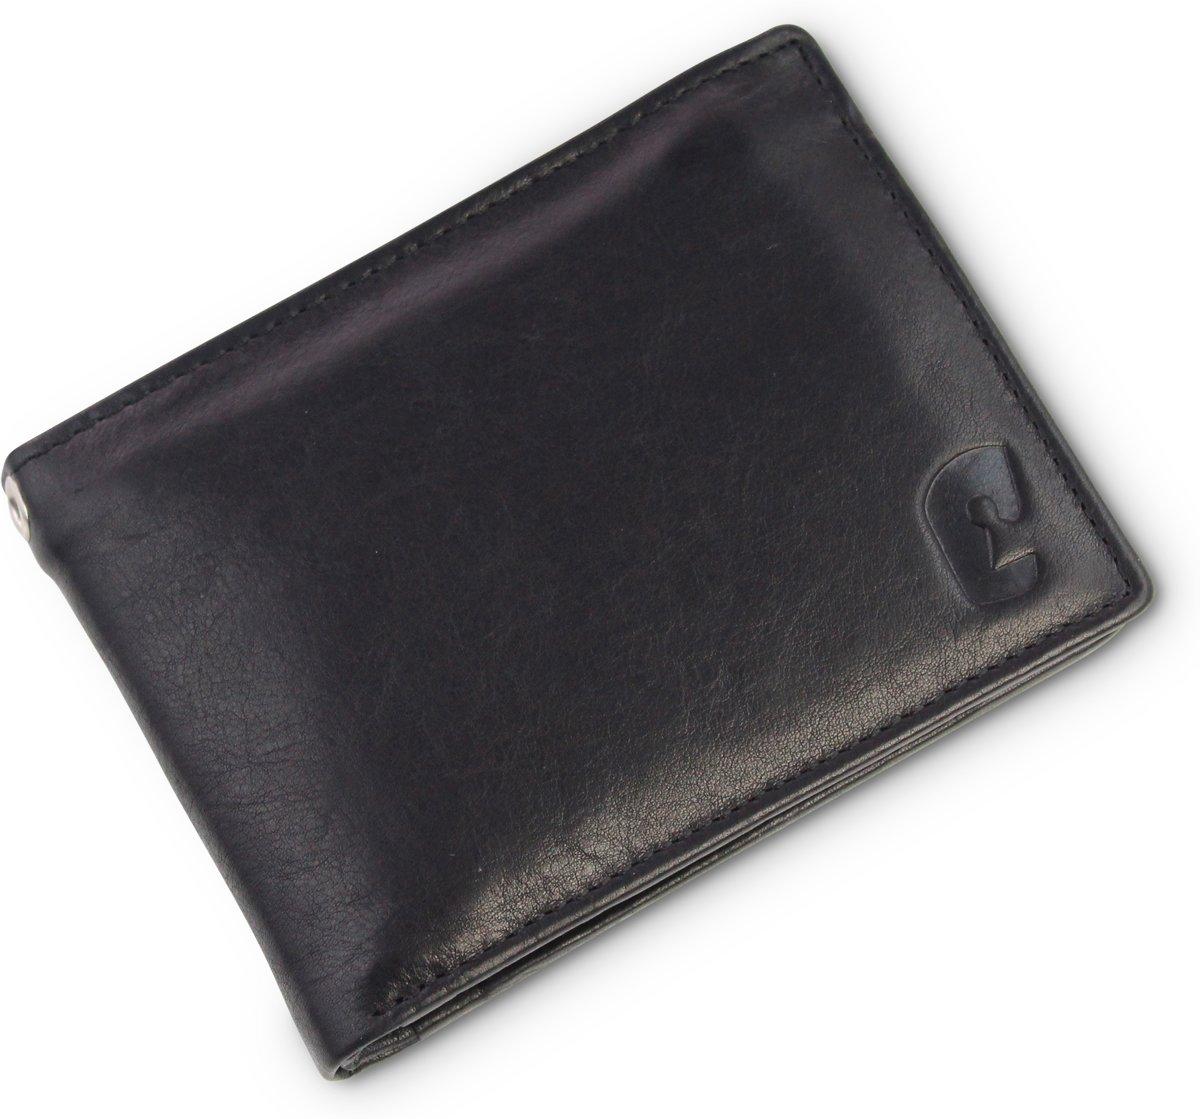 1b272a88be5 Safekeepers heren portemonnee - Large - RFID - Echt leer - Dublin - Zwart